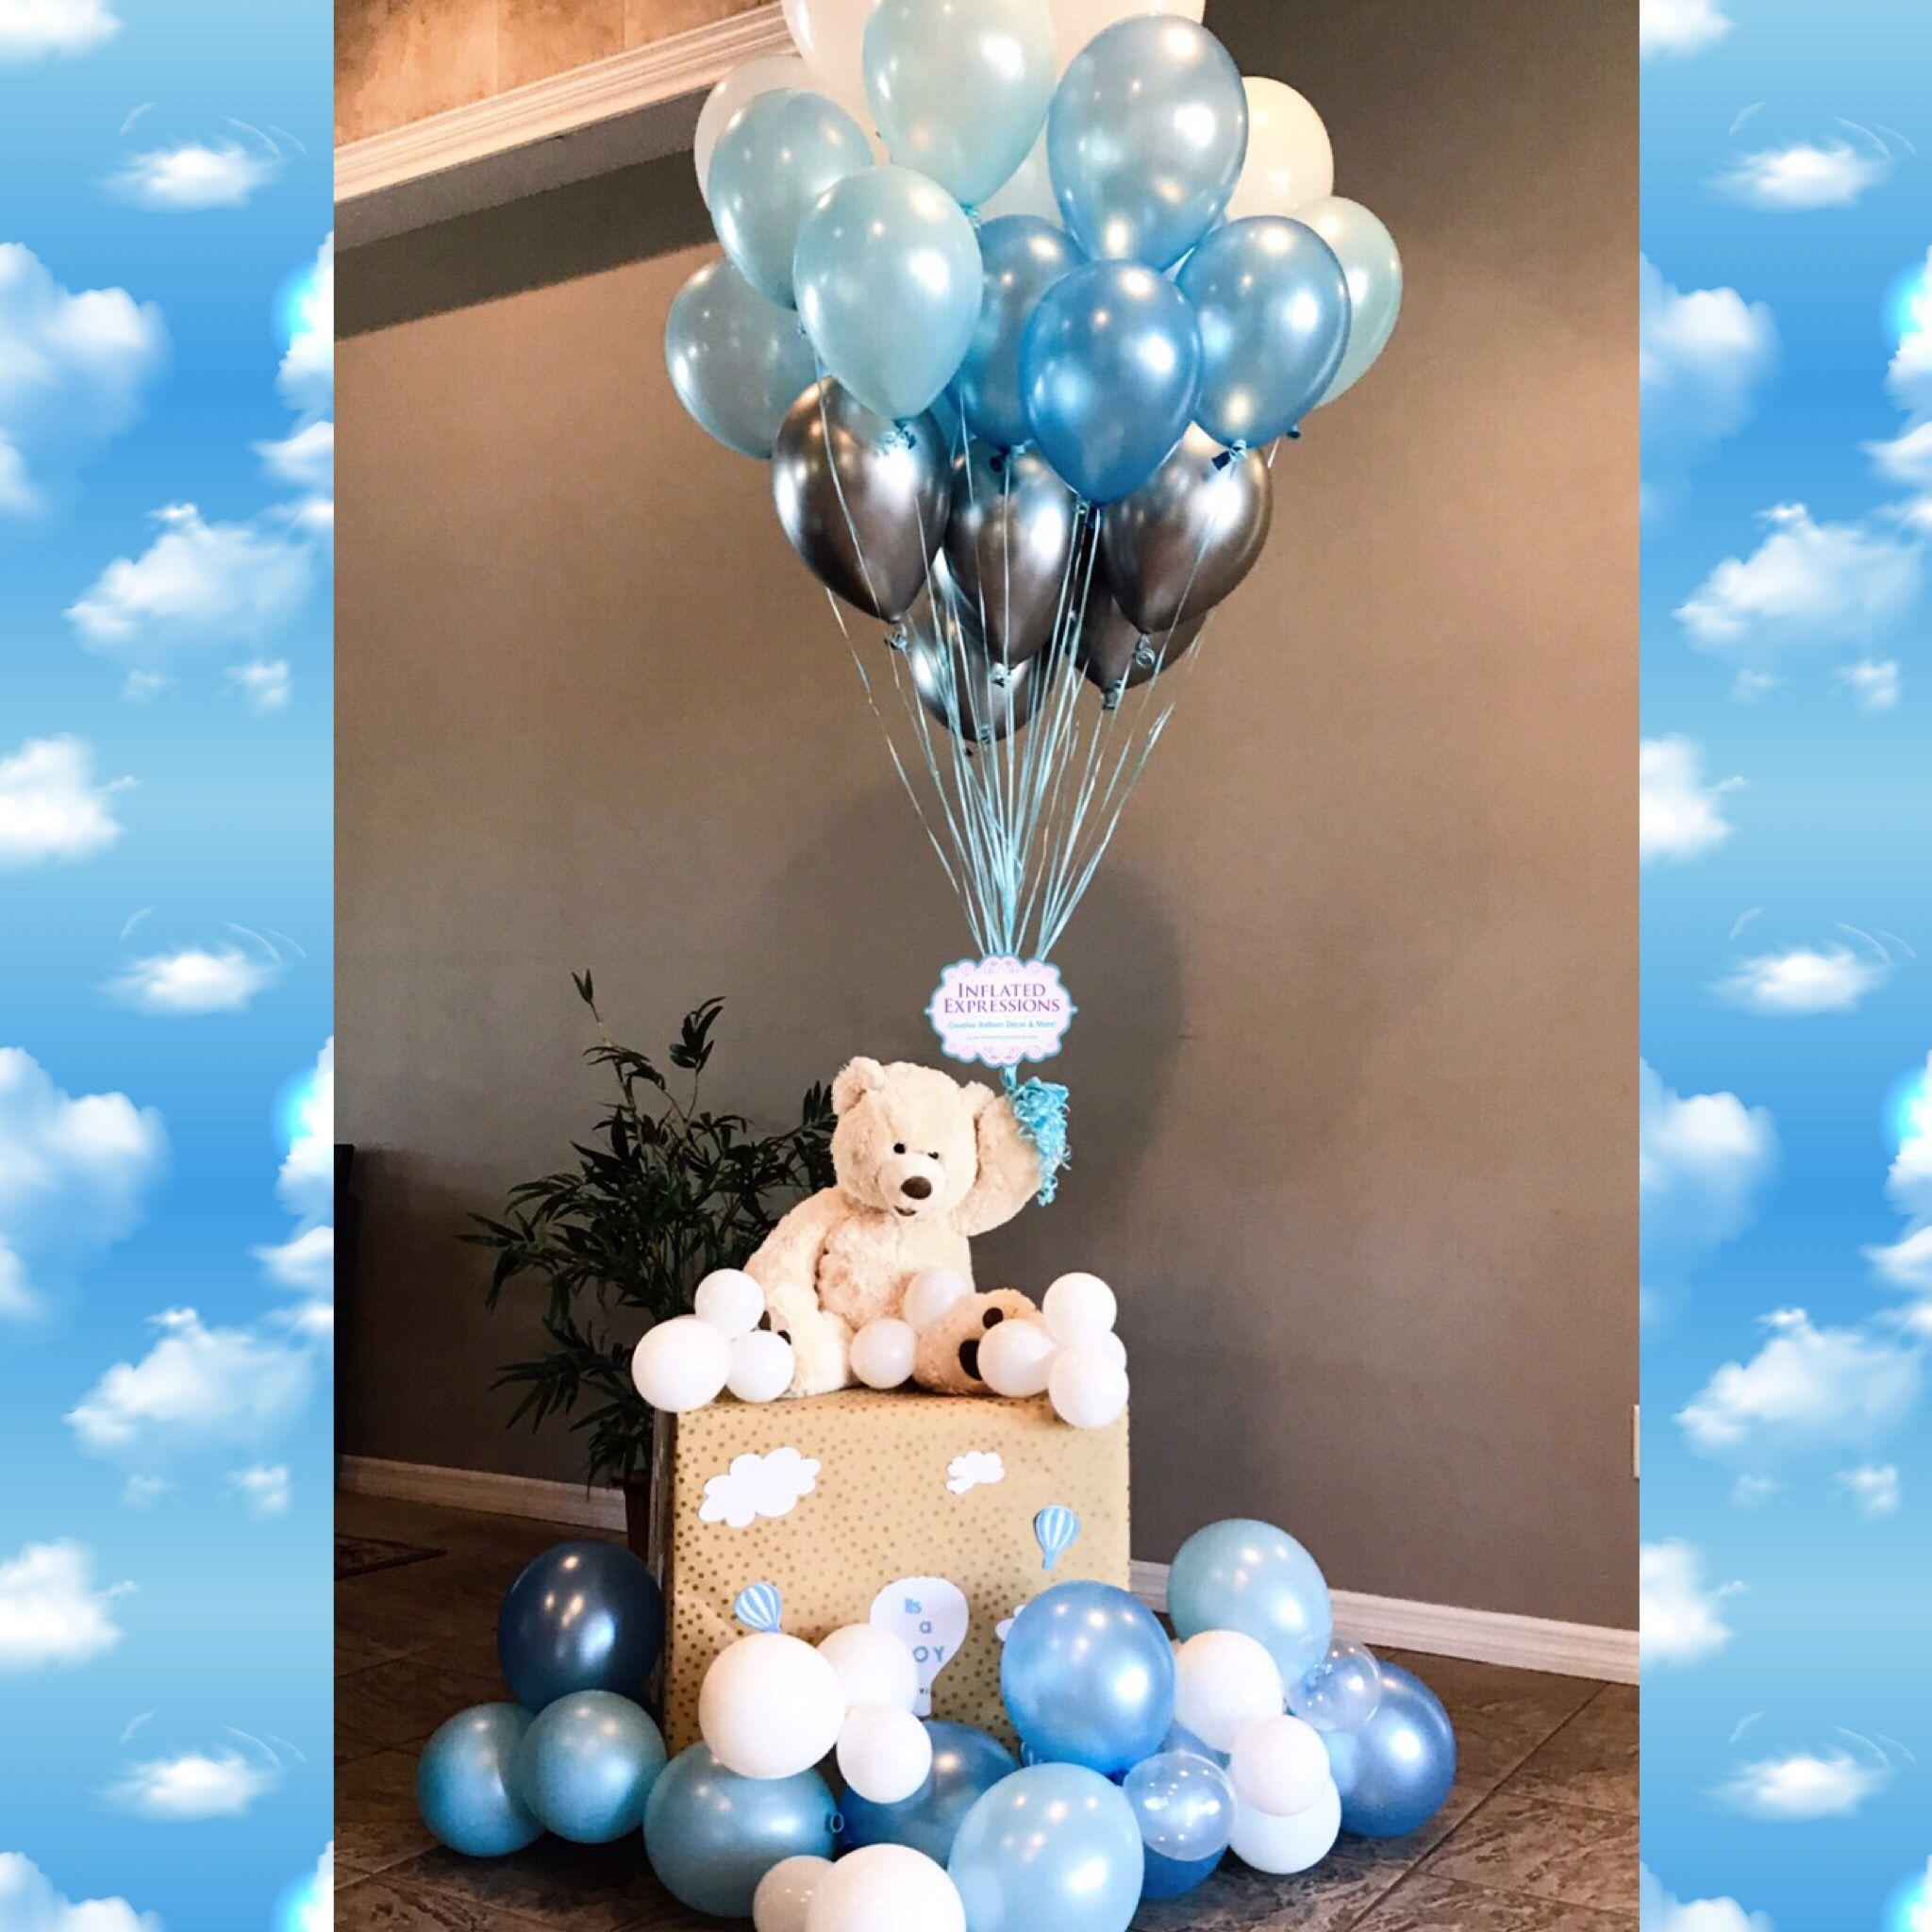 Teddy Bear Balloon Baby Shower Decoration It's A Boy